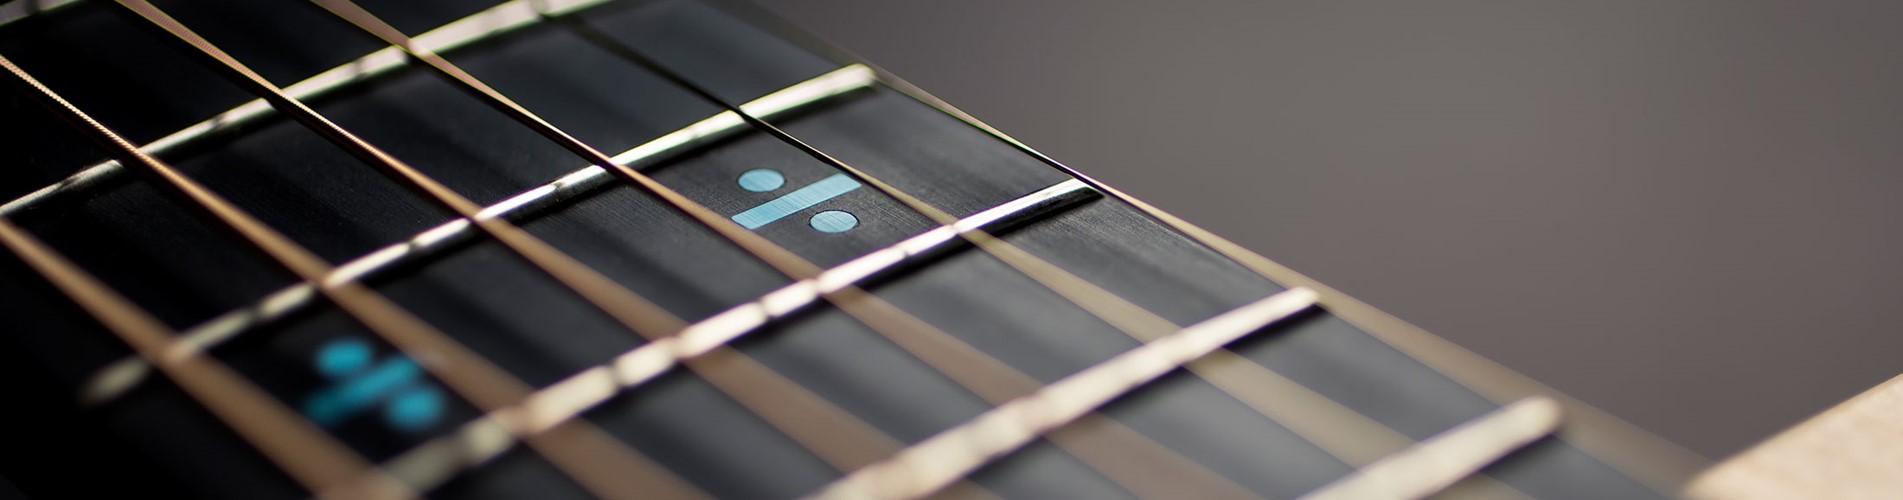 x-series-thumb.jpg